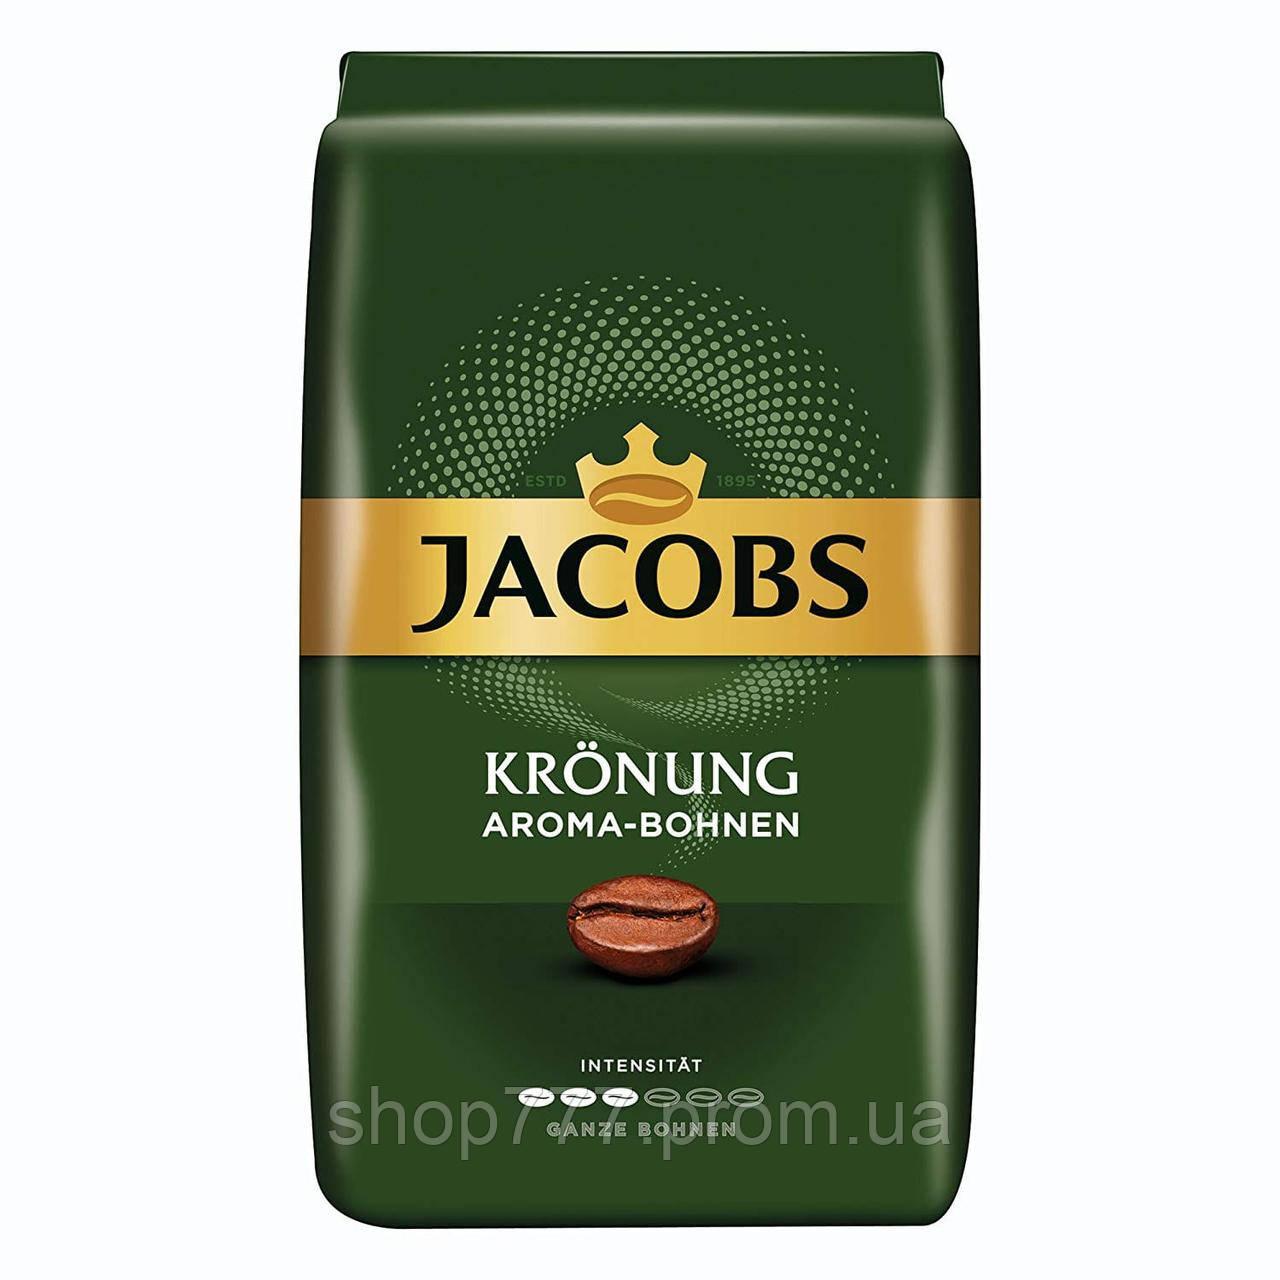 Jacobs Kronun Кофе в зернах 500 г